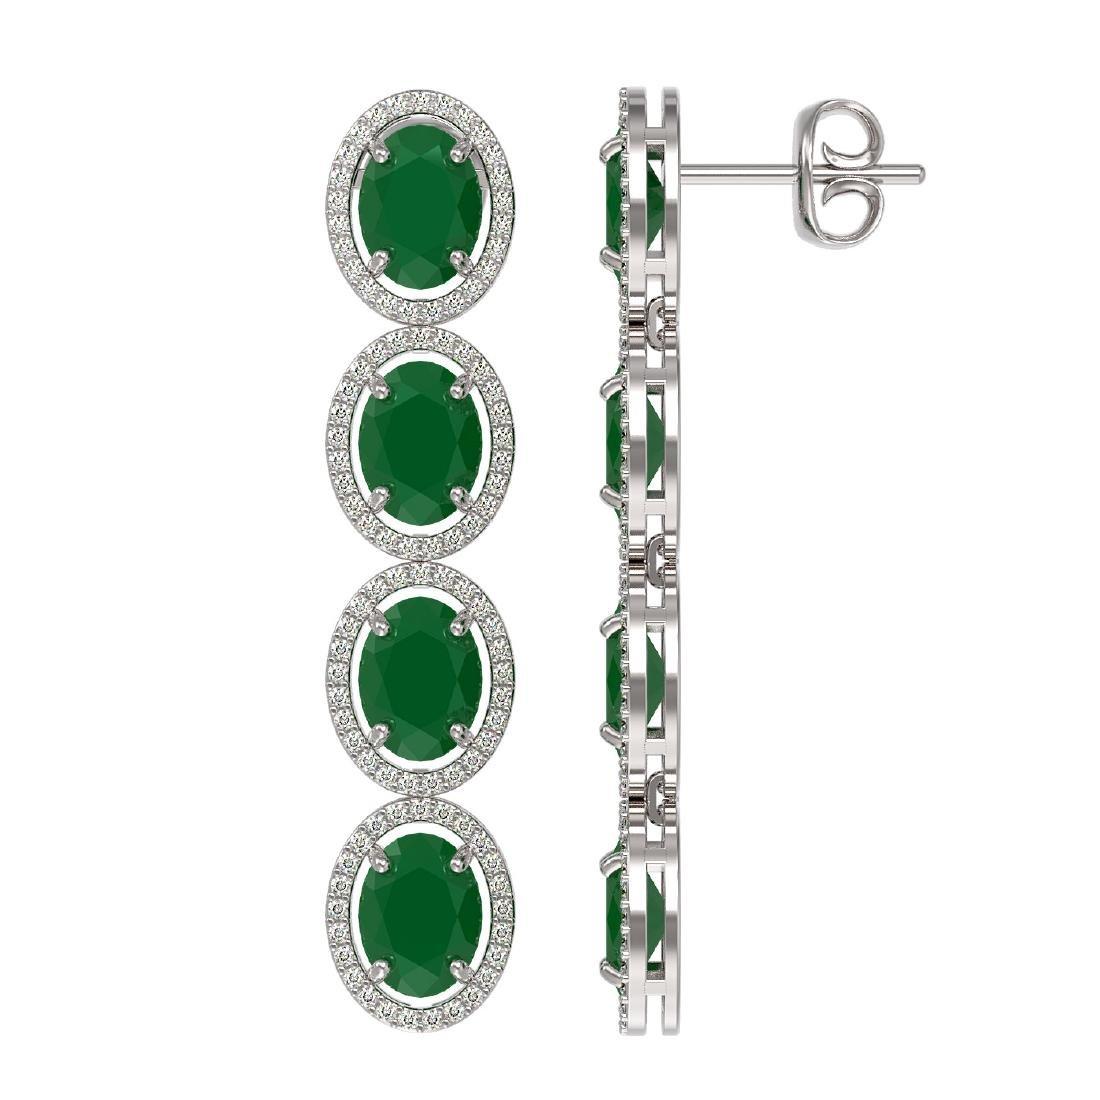 15.68 ctw Emerald & Diamond Halo Earrings 10K White - 2